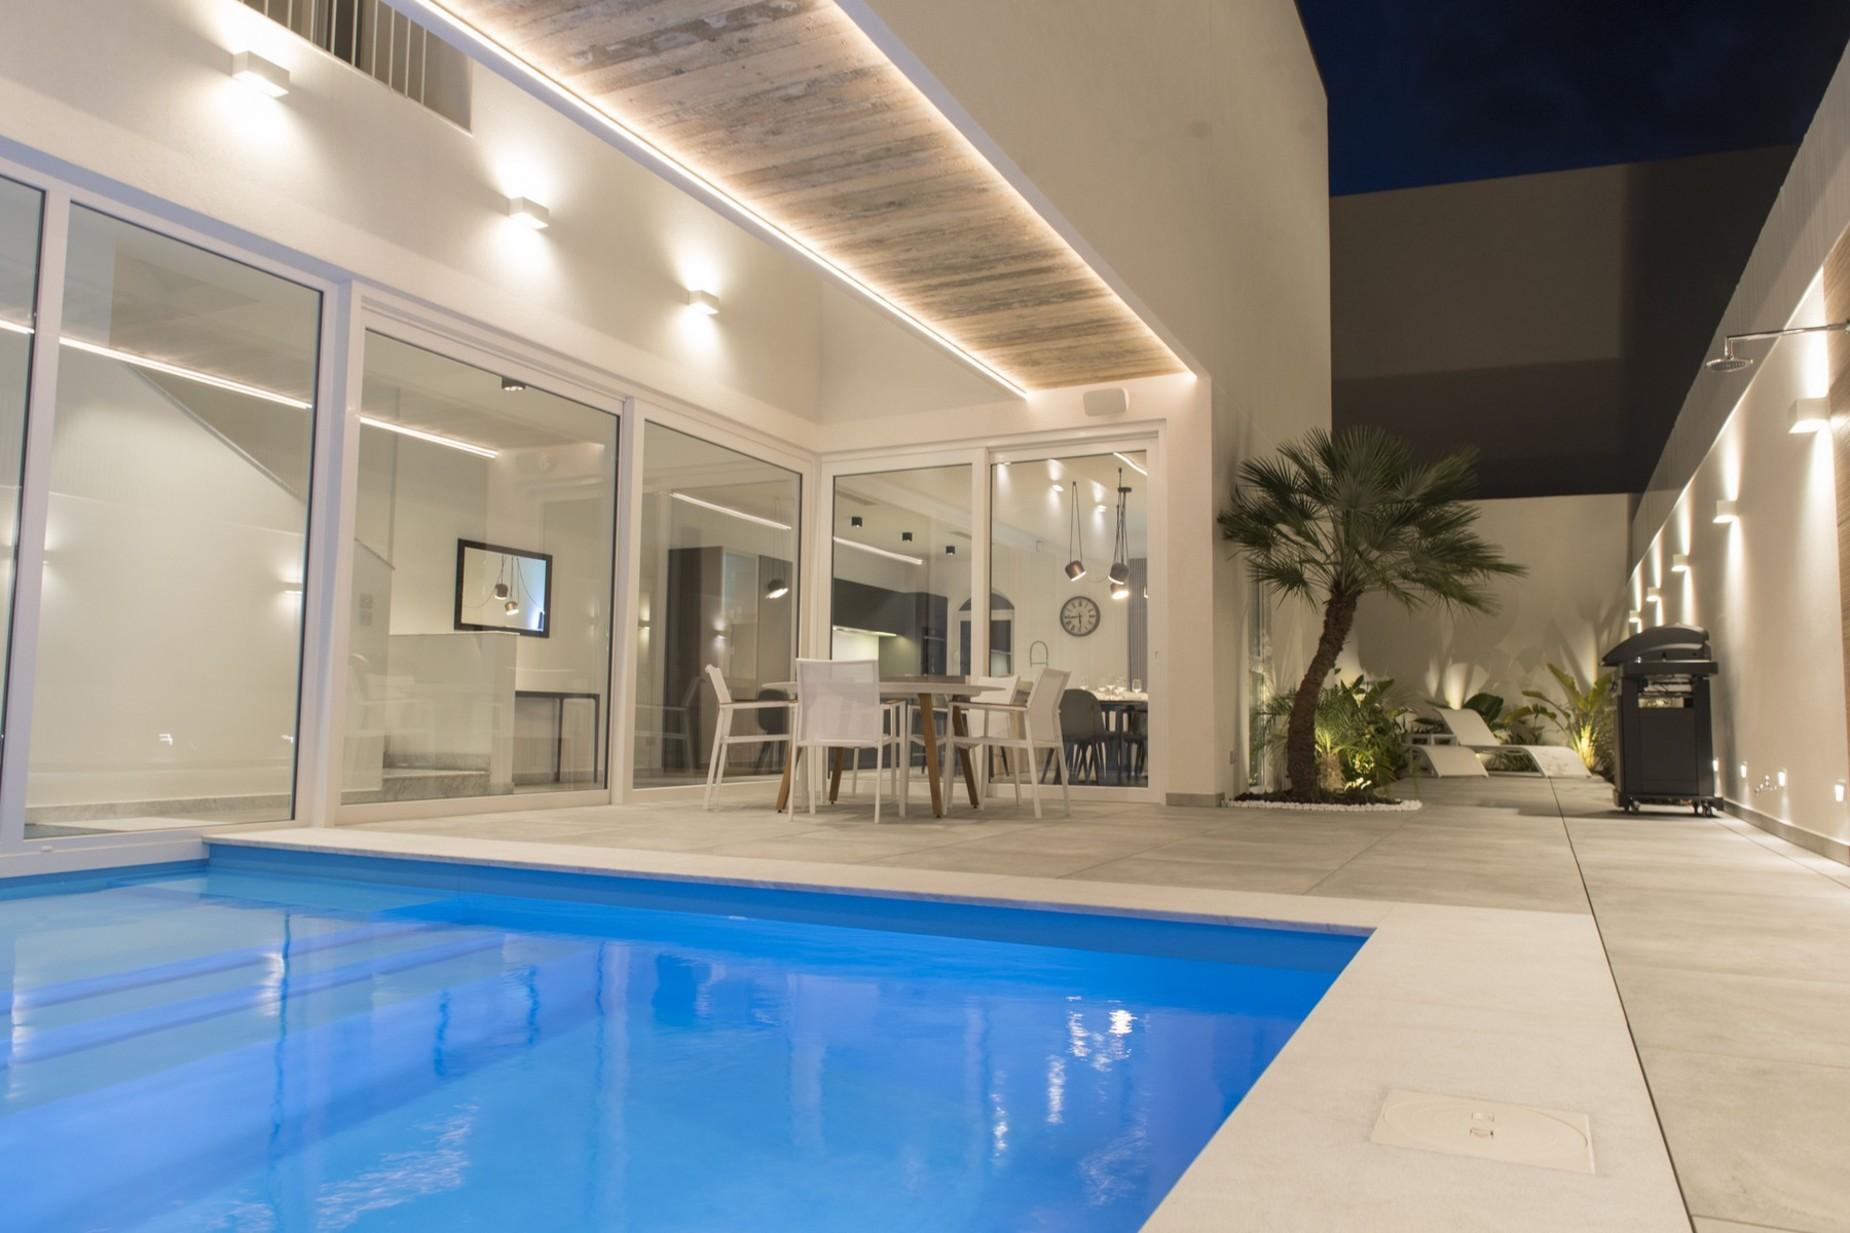 3 bed Villa For Rent in Ibragg, Ibragg - thumb 13